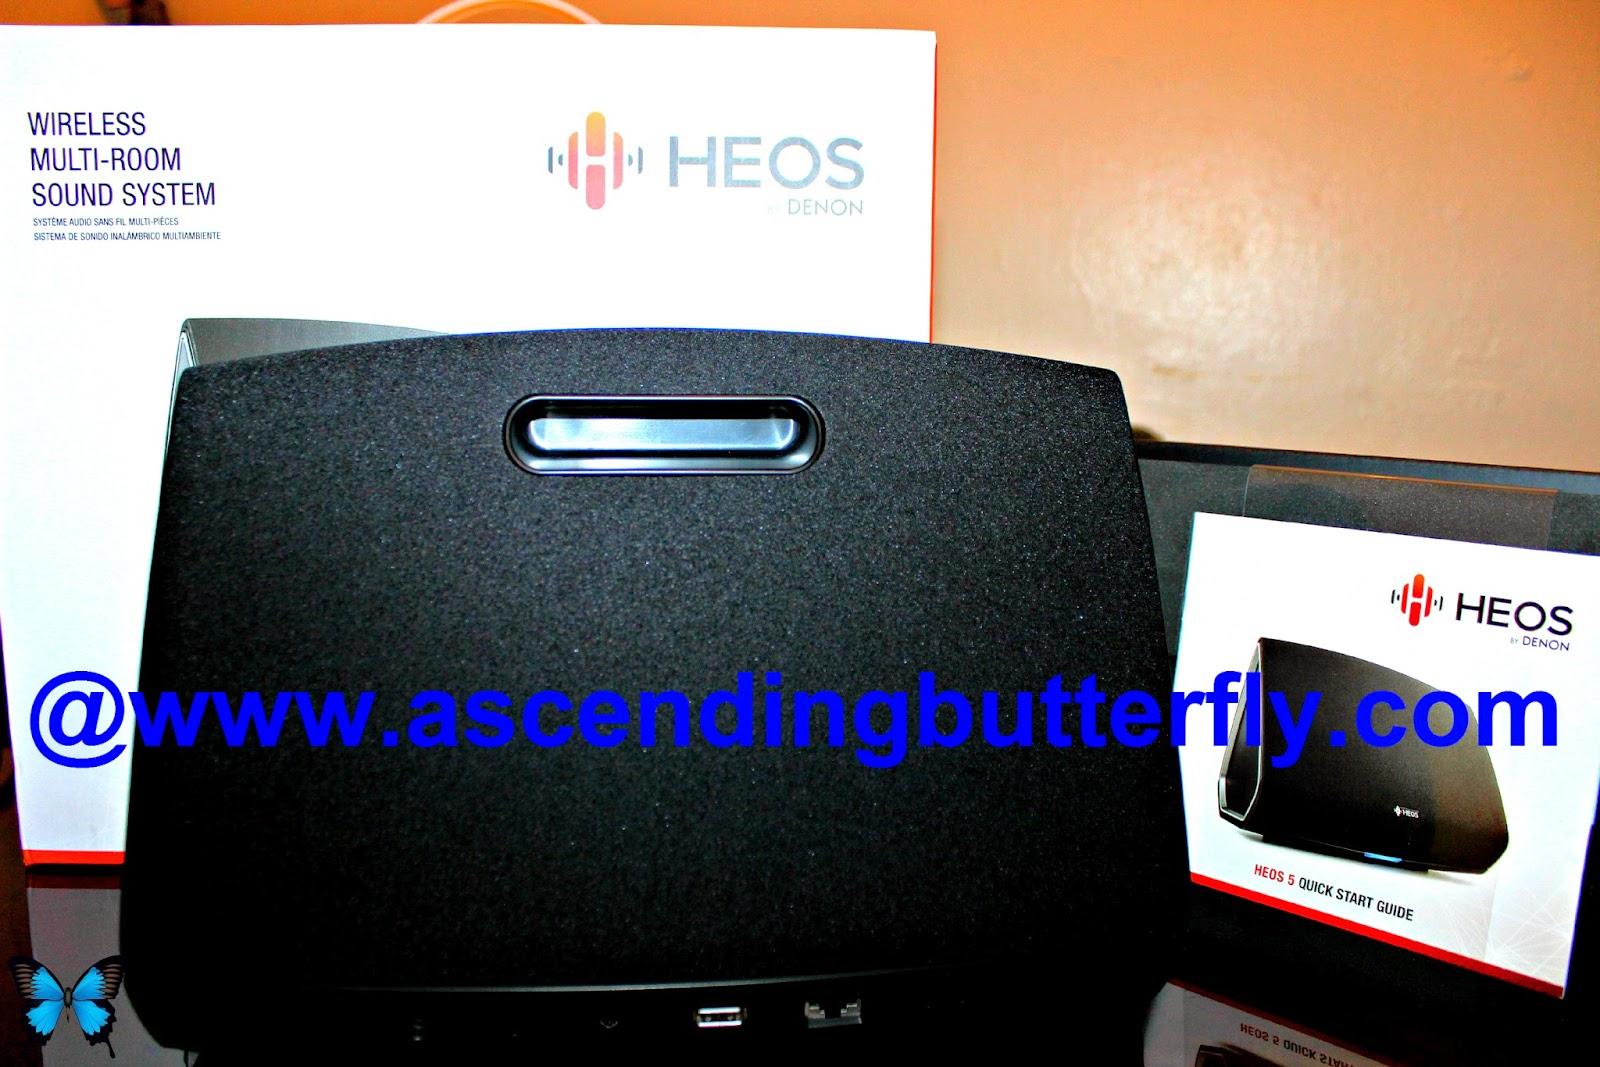 Denon HEOS 5 Multi-Room Wireless Sound System, Portable Speaker, Music System